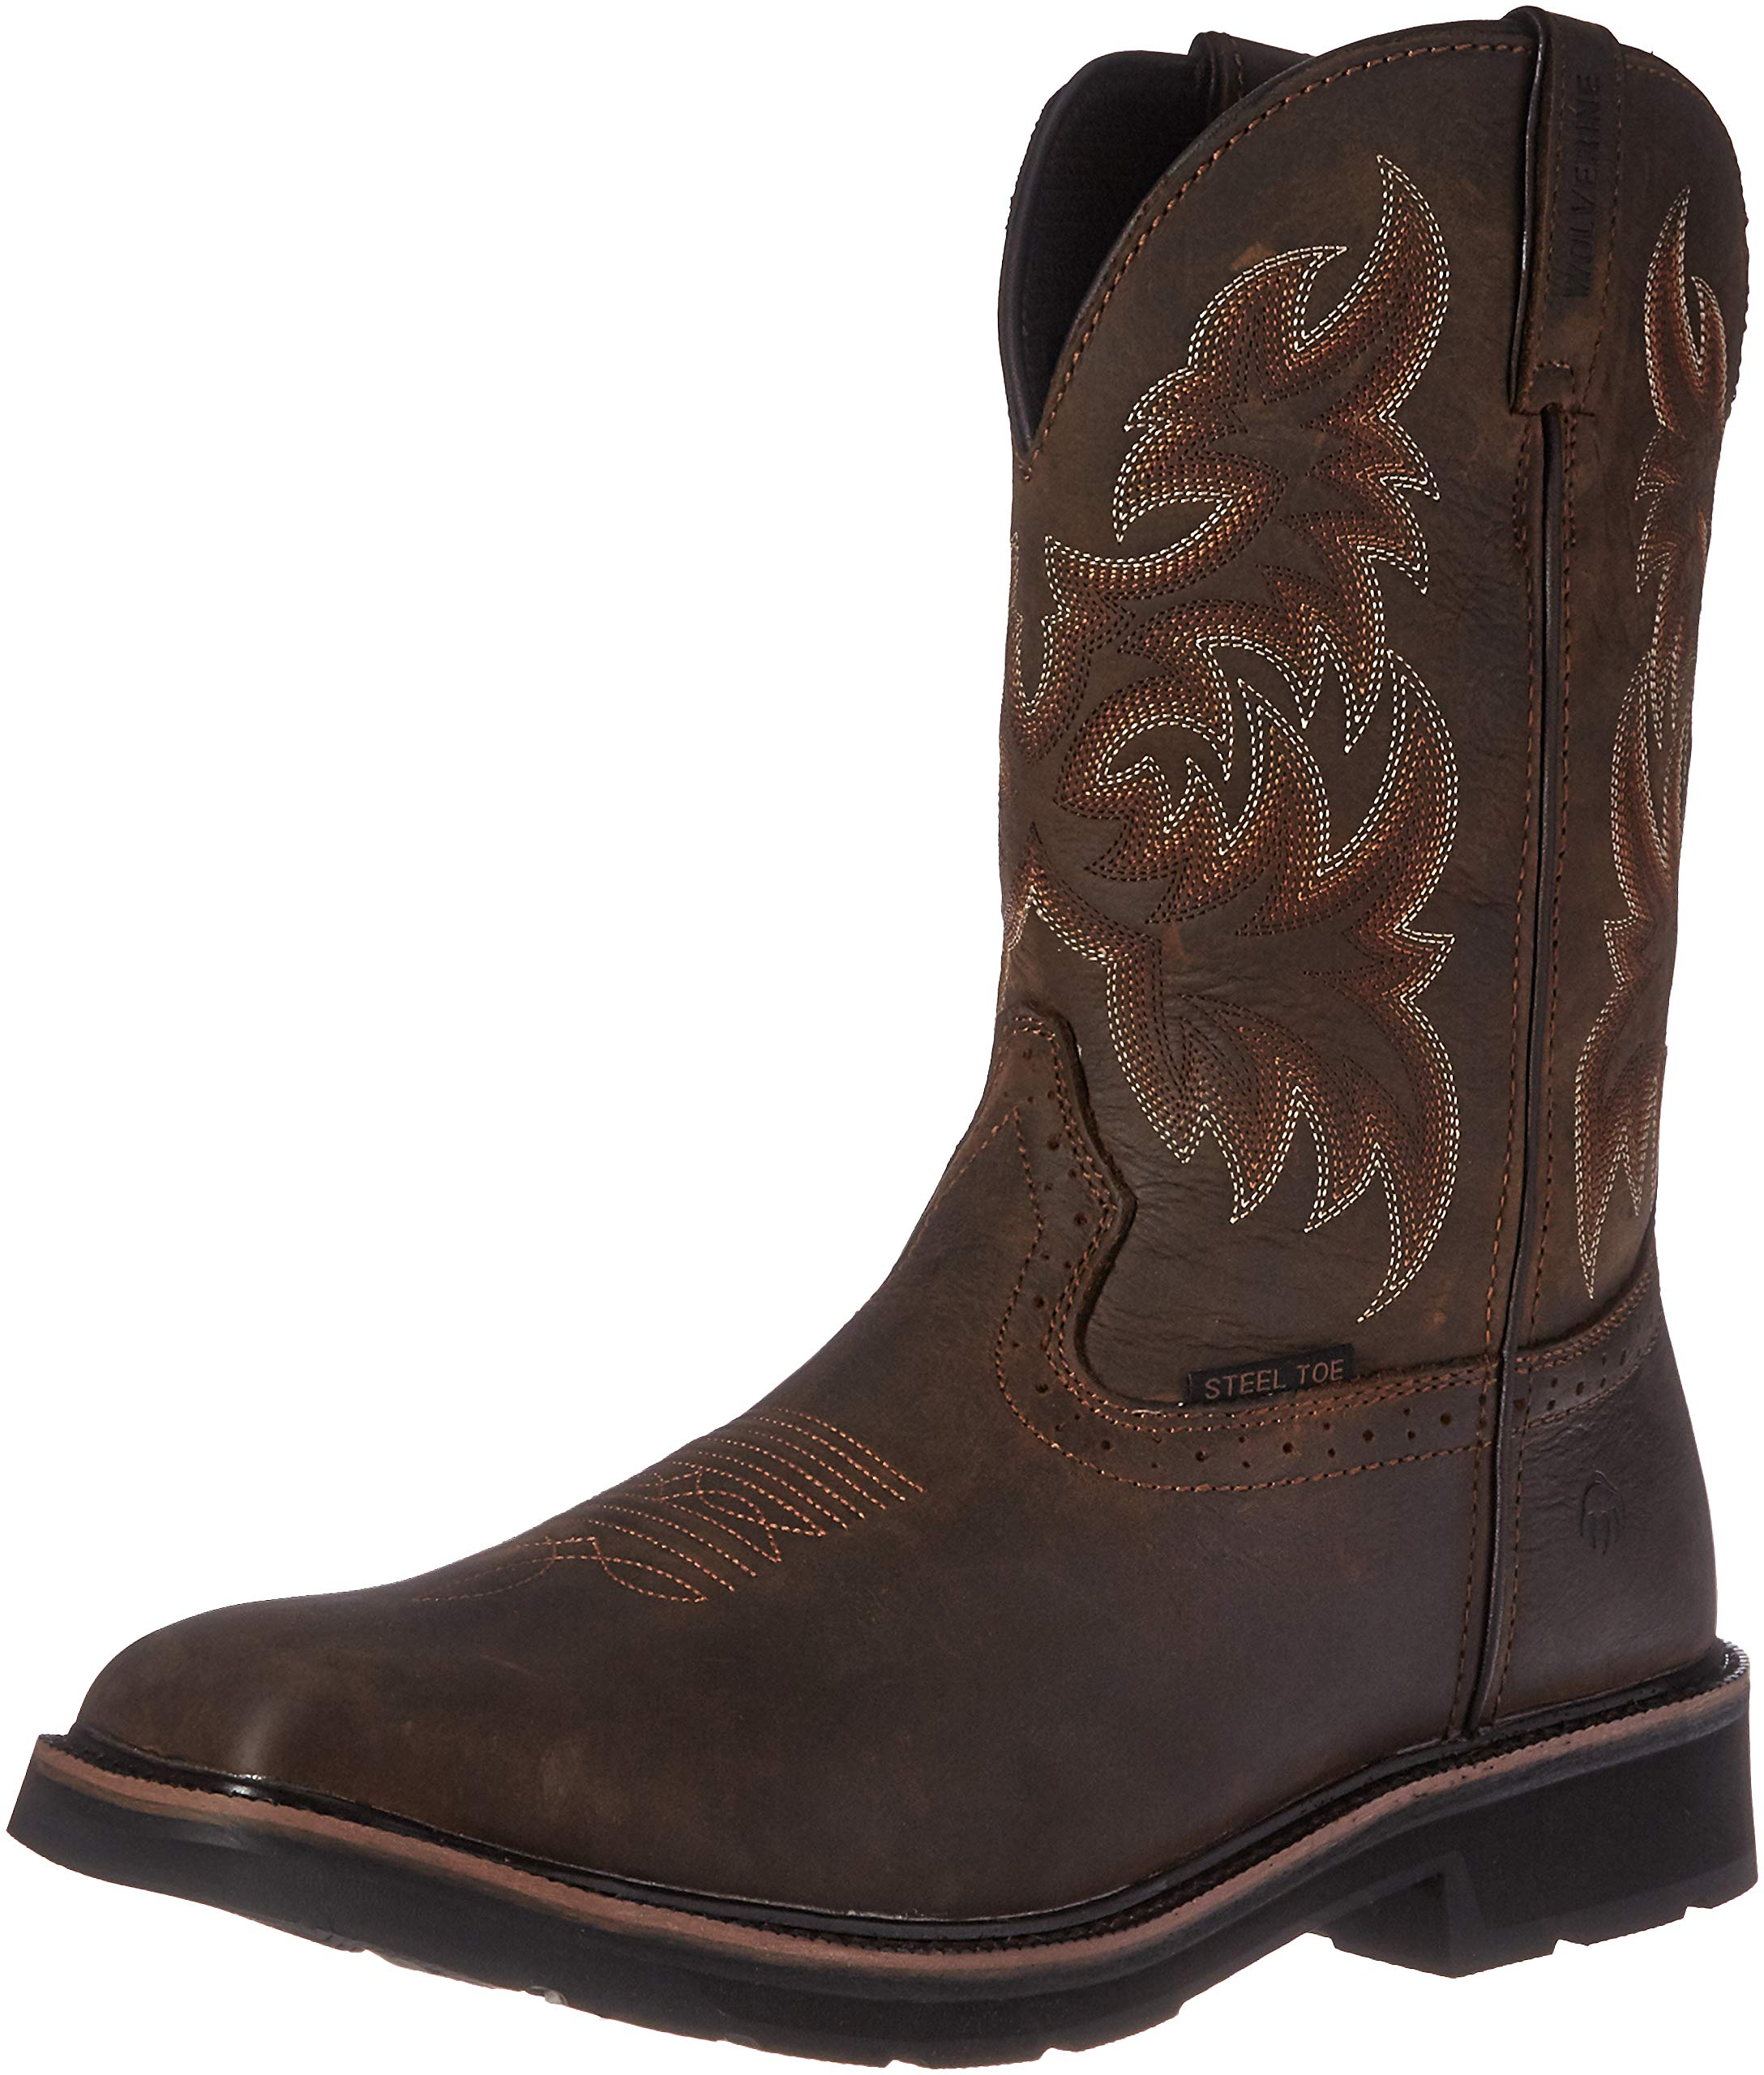 Wolverine Men's Rancher 10'' Square Steel Toe Work Boot, Dark Brown/Rust, 9 M US